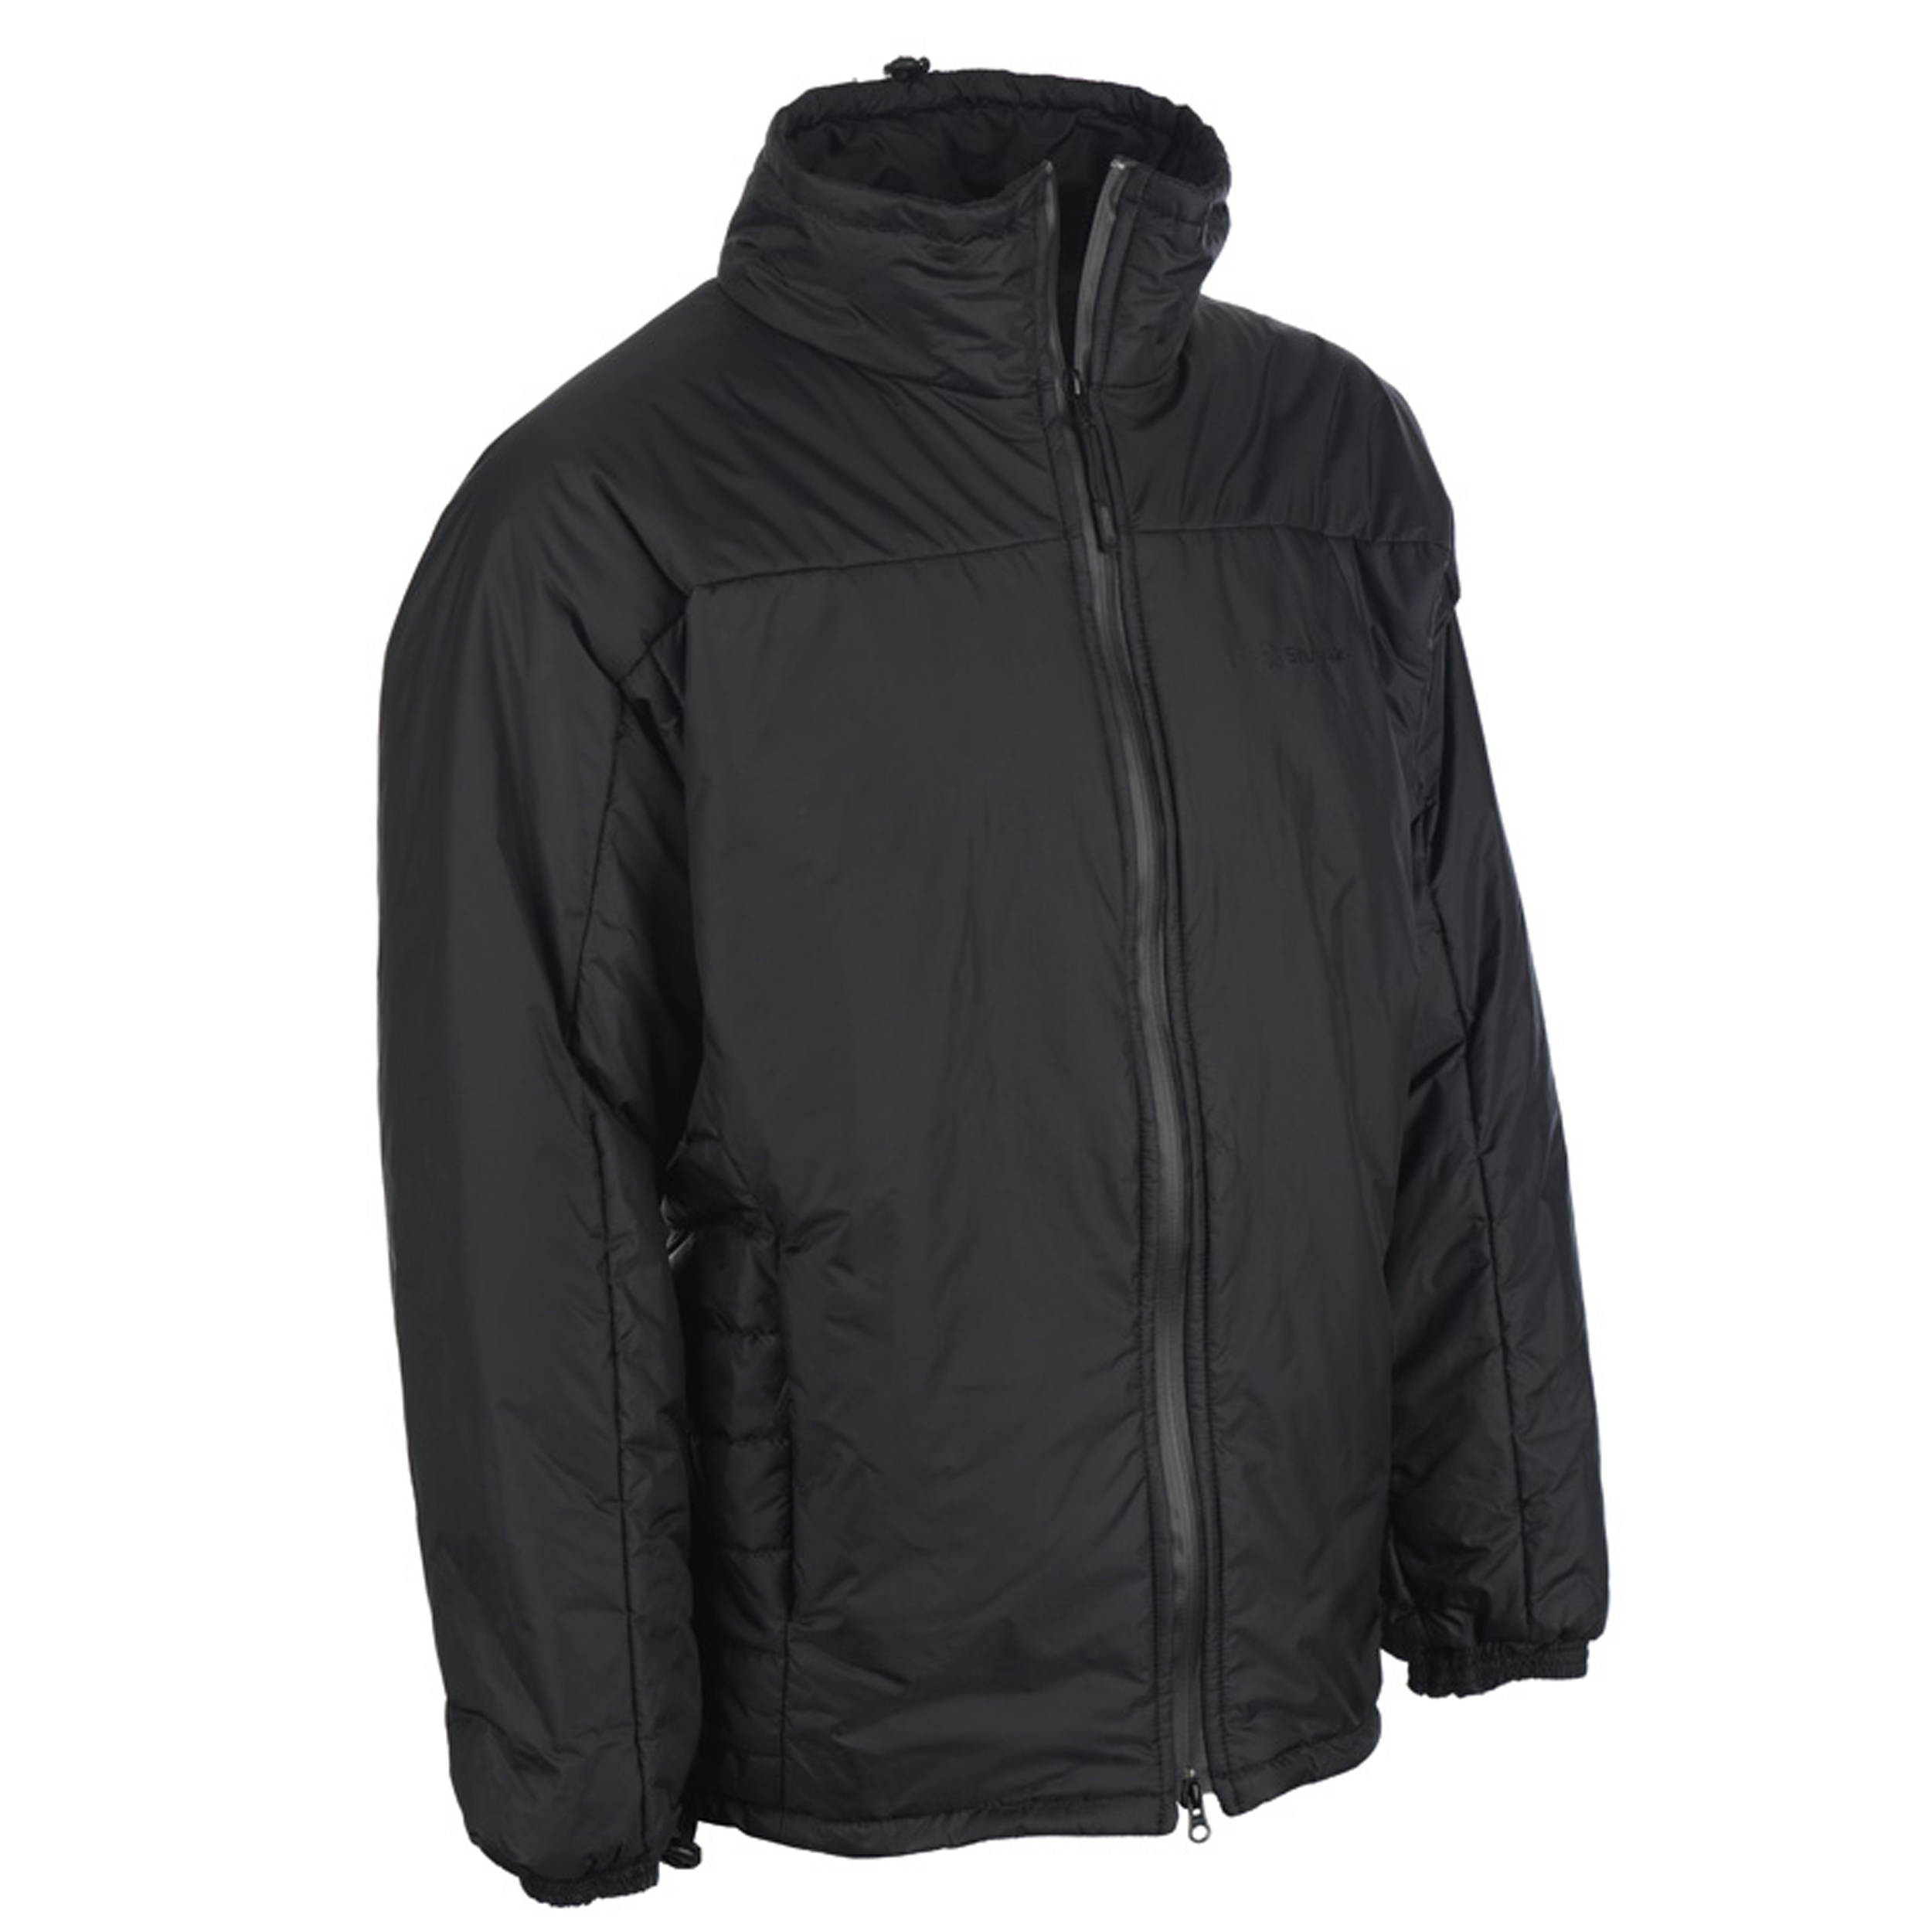 Snugpak Sj9 Jacket Black Xxl